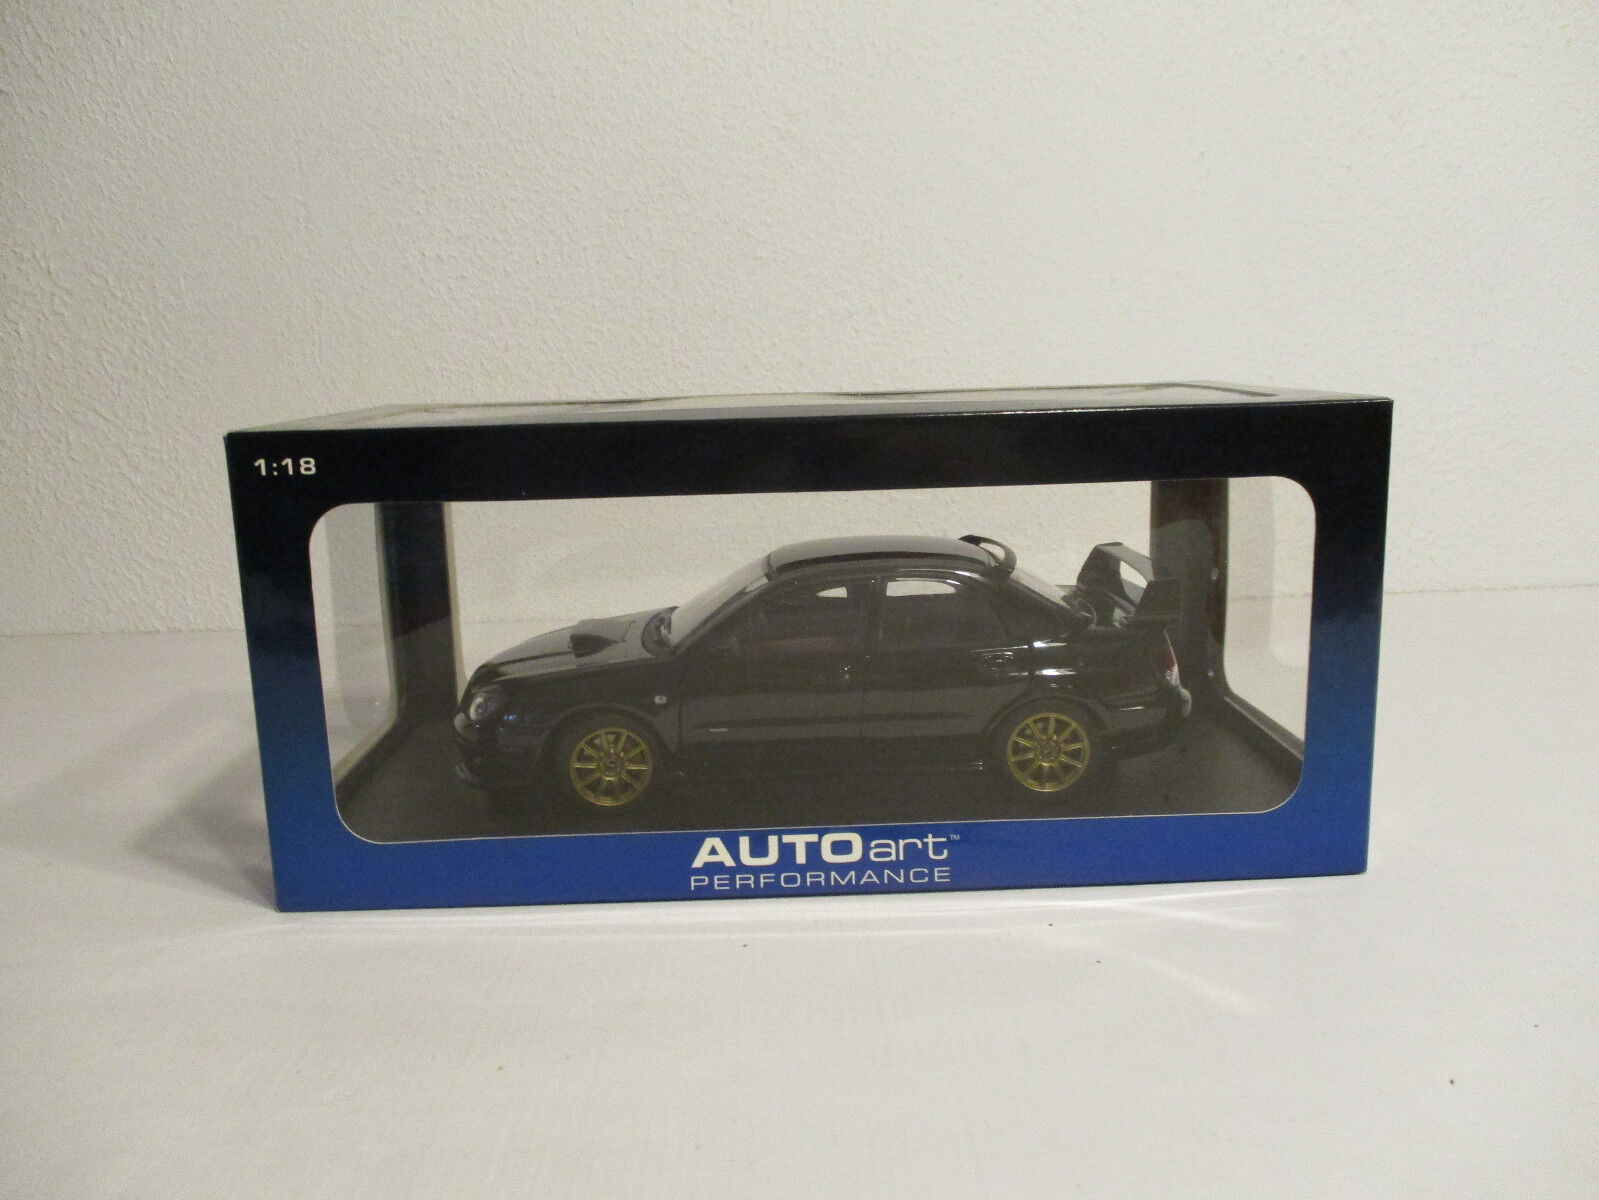 ( Gok ) 1 18 Autoart Subaru Impreza Wrx Sti 2006 Negro Nuevo Emb. Orig.